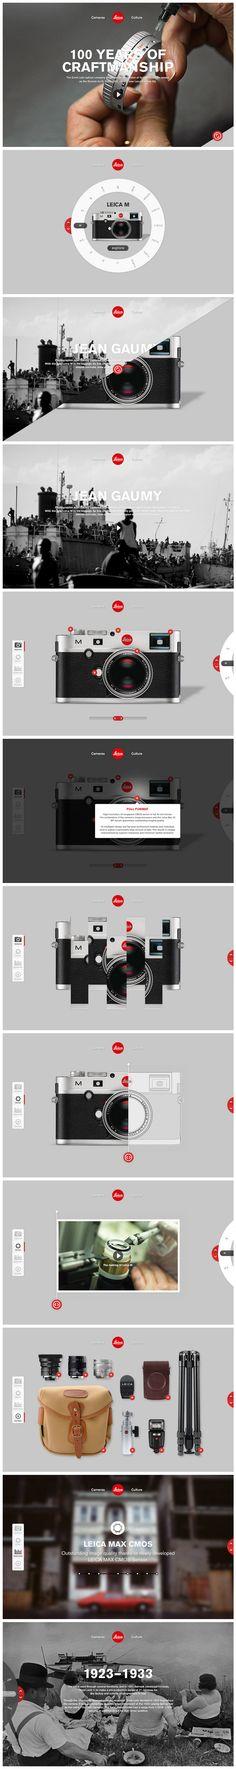 Leica | #webdesign #it #web #design #layout #userinterface #website #webdesign < repinned by www.BlickeDeeler.de | Take a look at www.WebsiteDesign-Hamburg.de